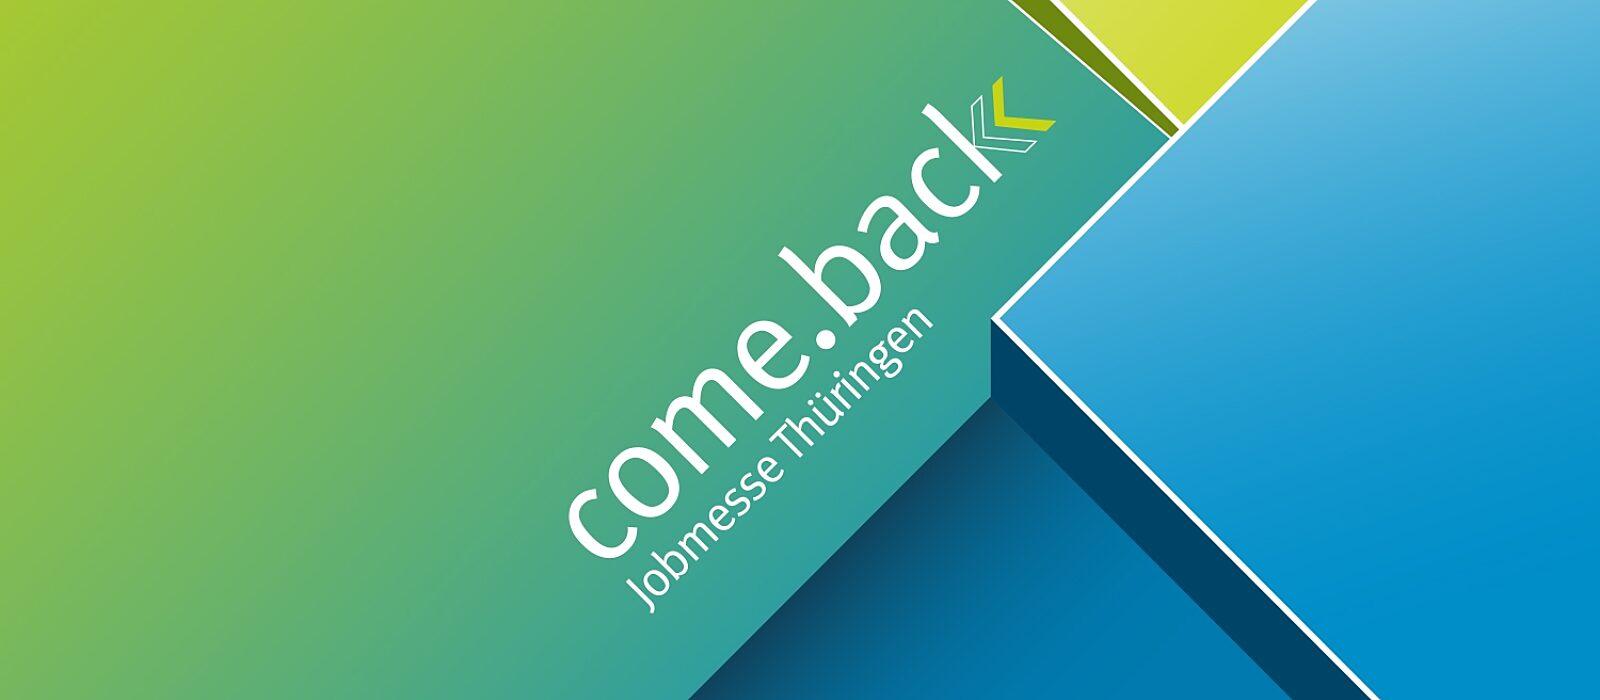 Jobmesse comeback Copyright: LEG Thüringen